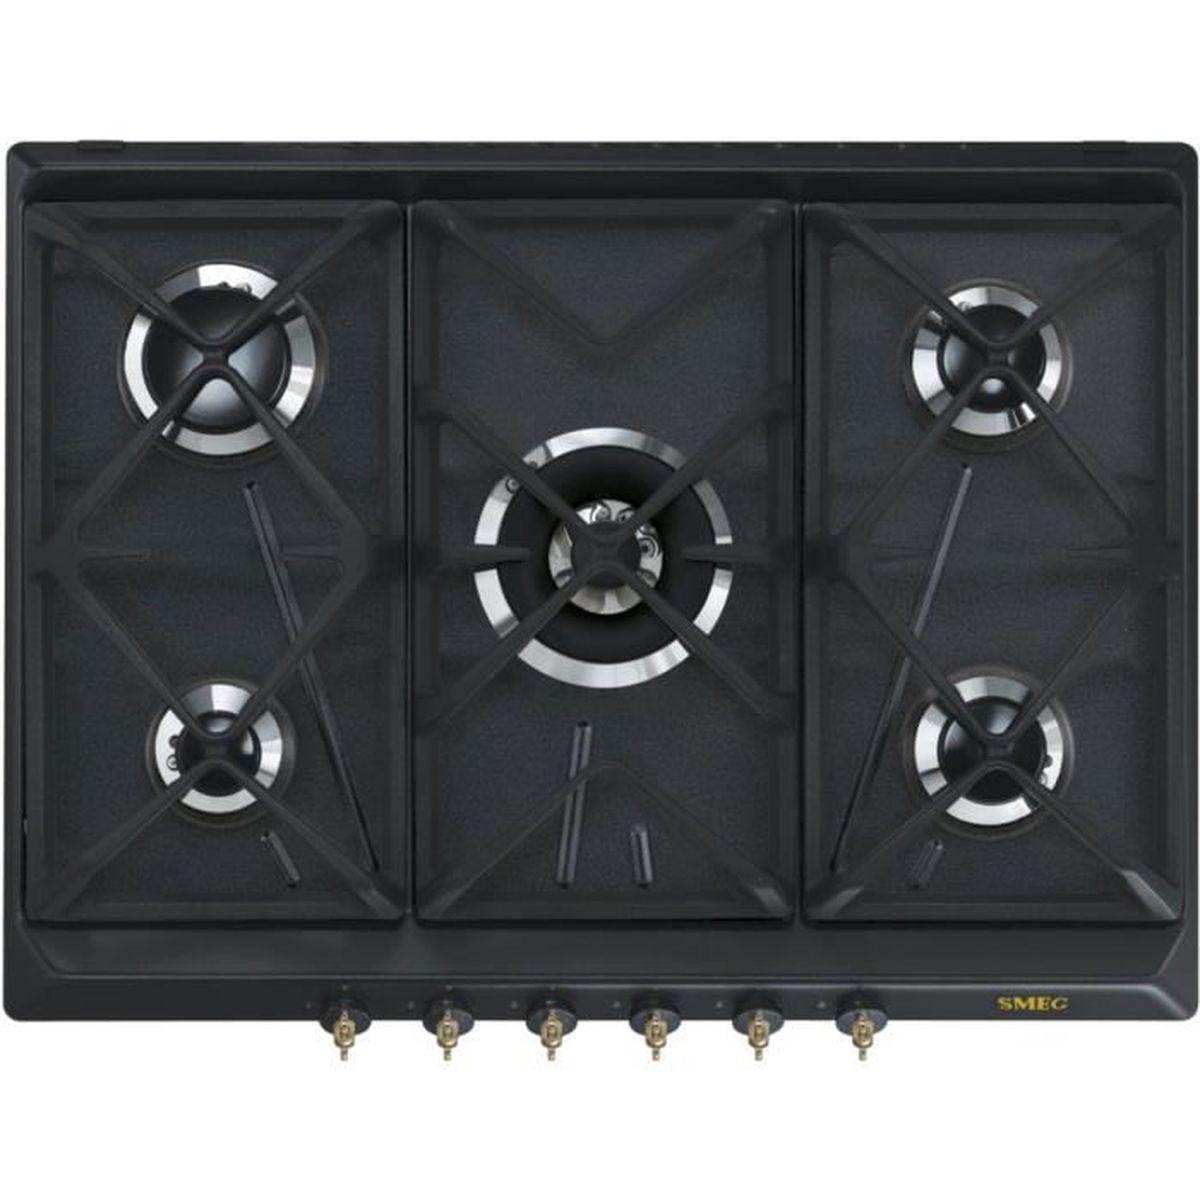 table gaz smeg srv876aogh achat vente plaque gaz soldes cdiscount. Black Bedroom Furniture Sets. Home Design Ideas